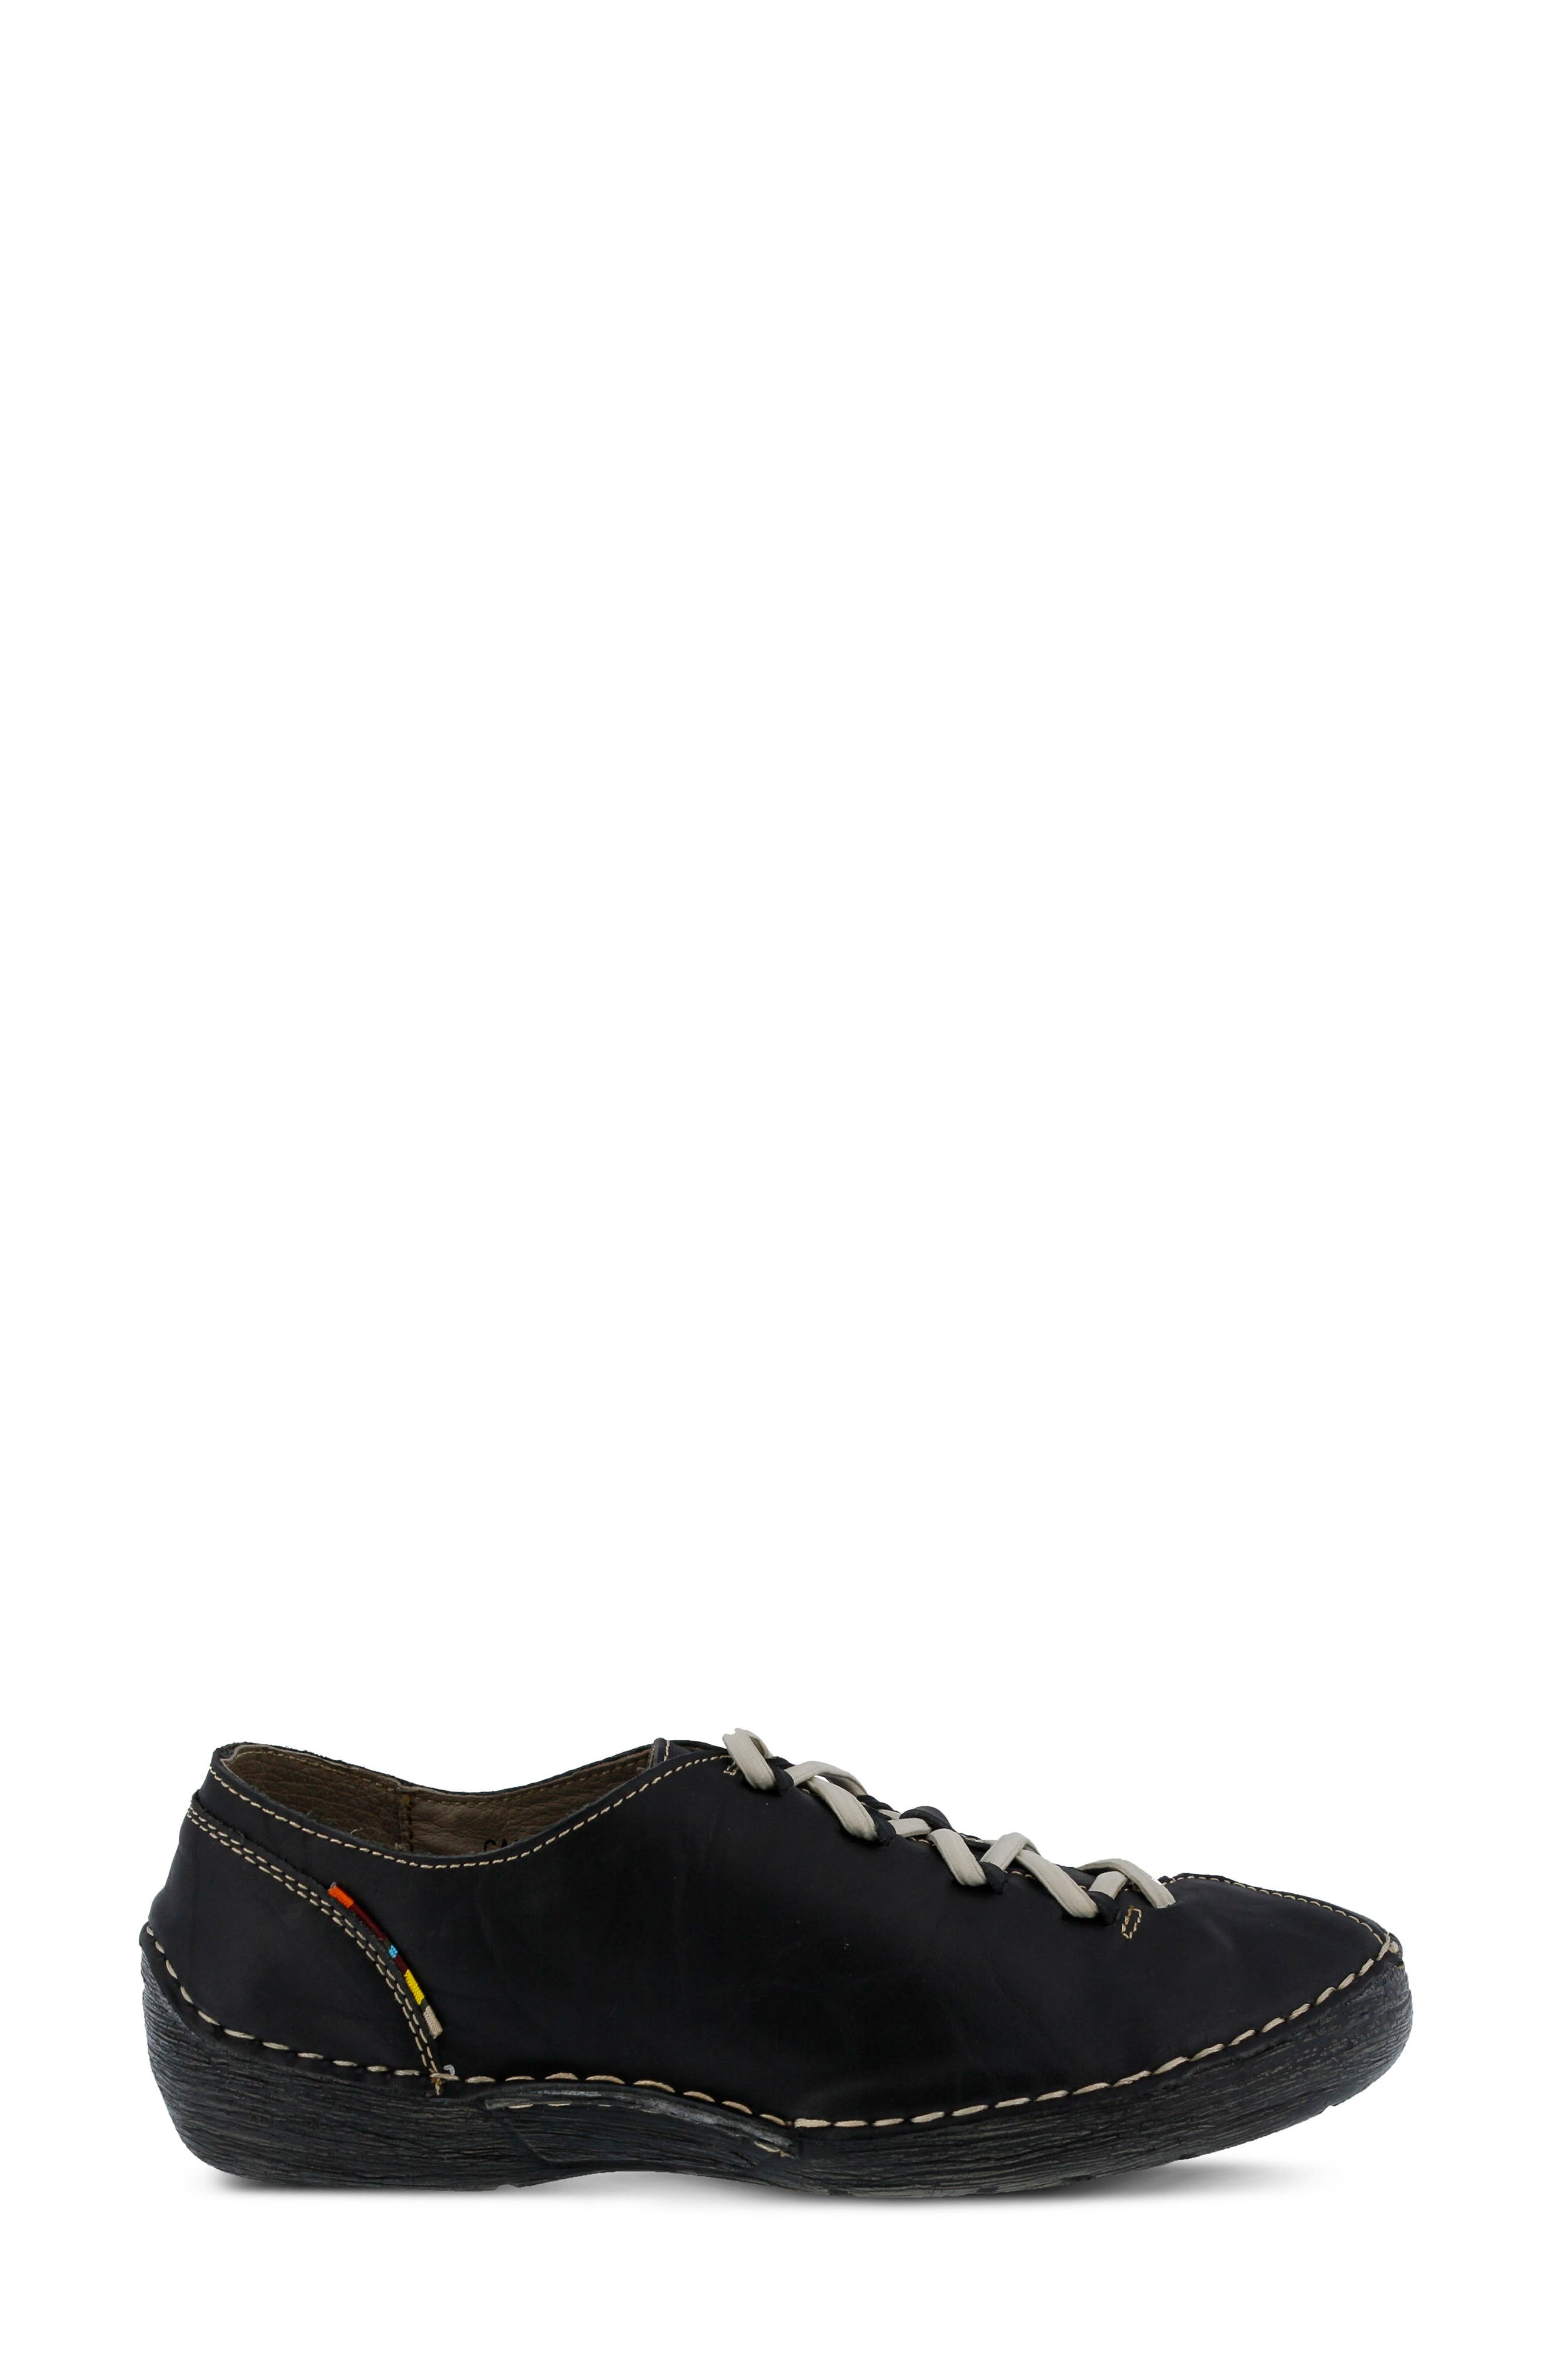 Carhop Sneaker,                             Alternate thumbnail 3, color,                             BLACK LEATHER